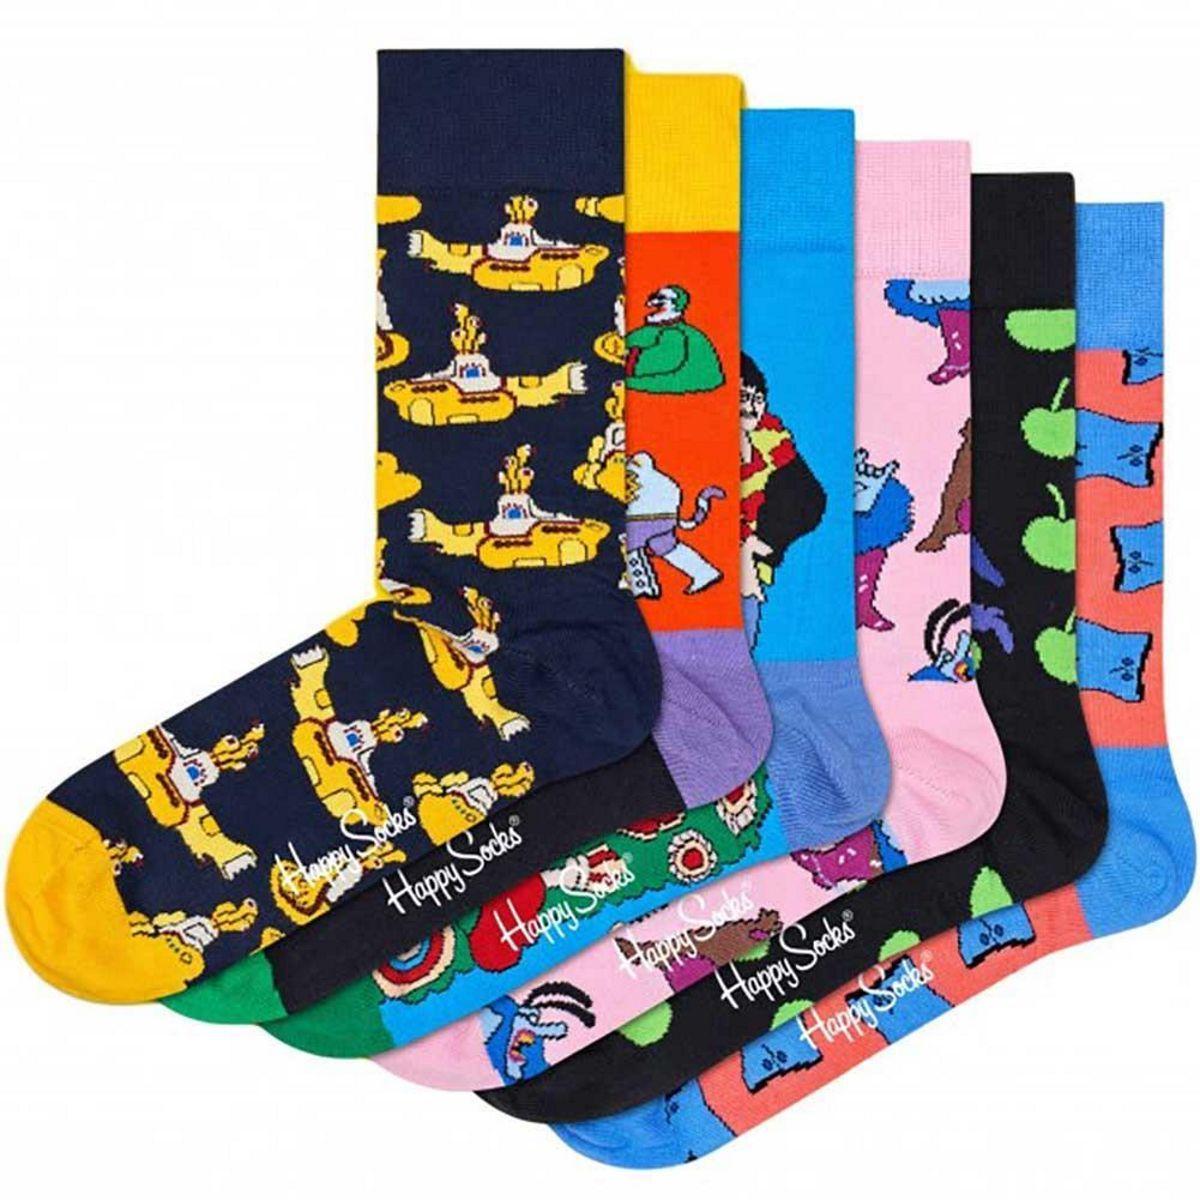 4317924c52ff2 Happy Socks The Beatles Collection Box Set - Multi   Birthday ...